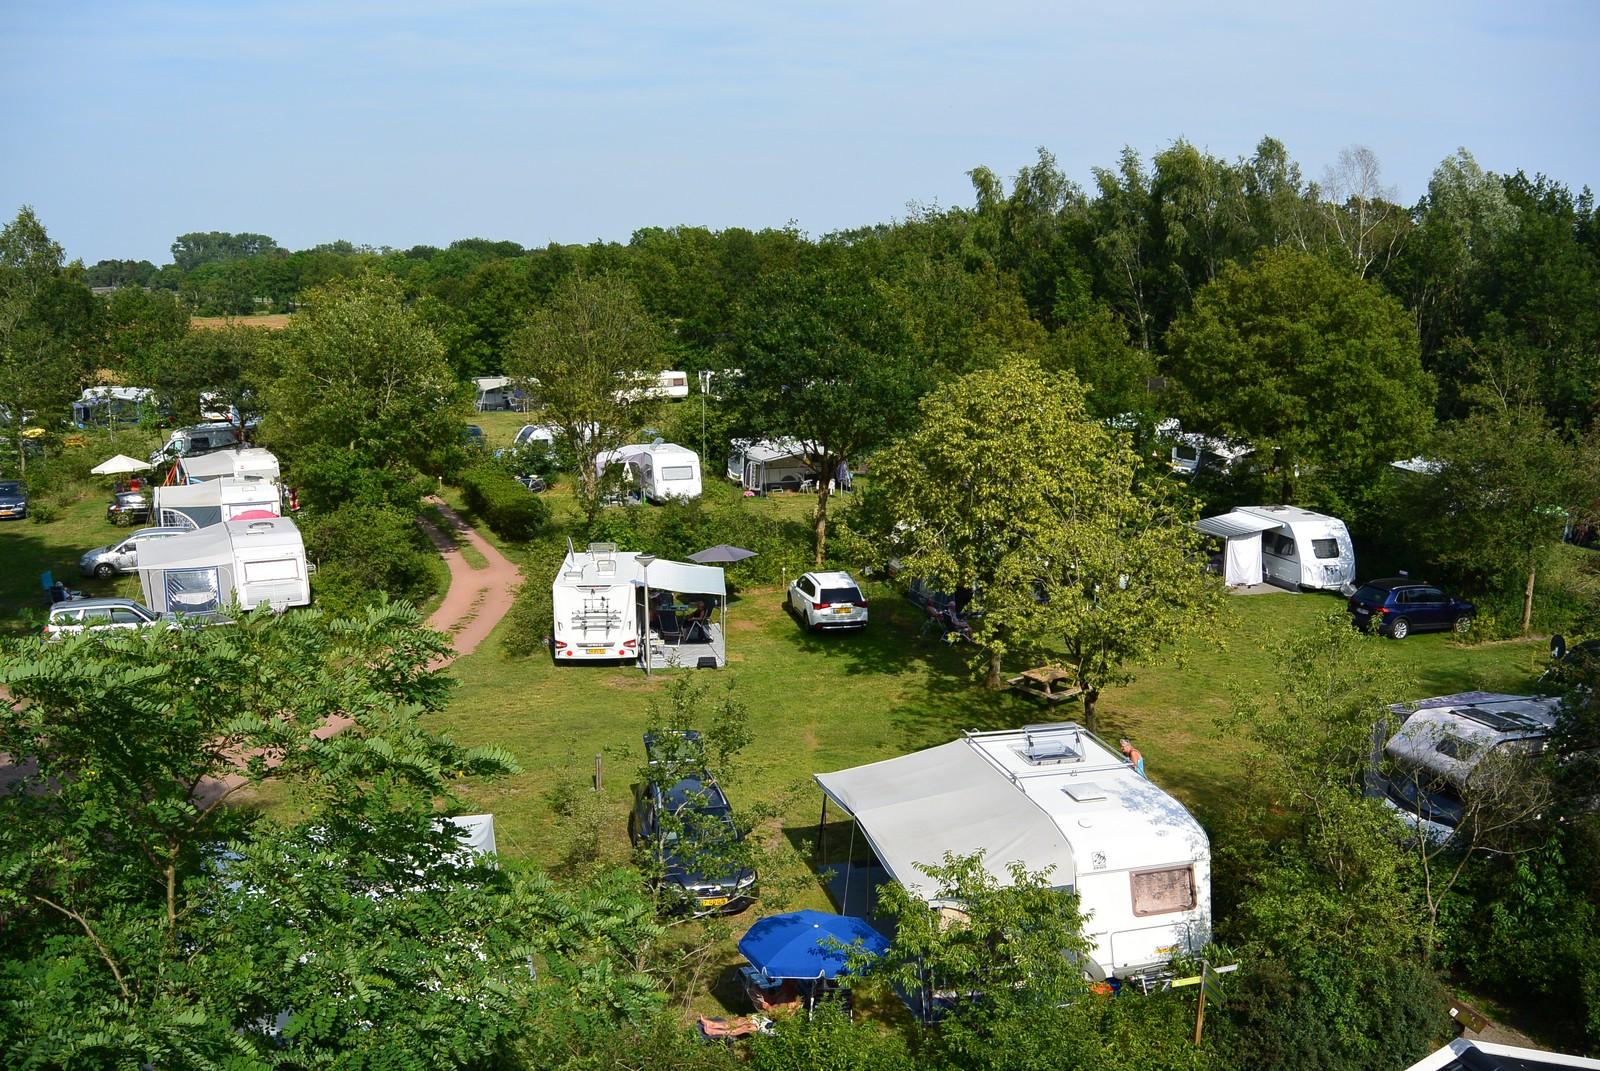 Camping_jellyshoeve_havelte04